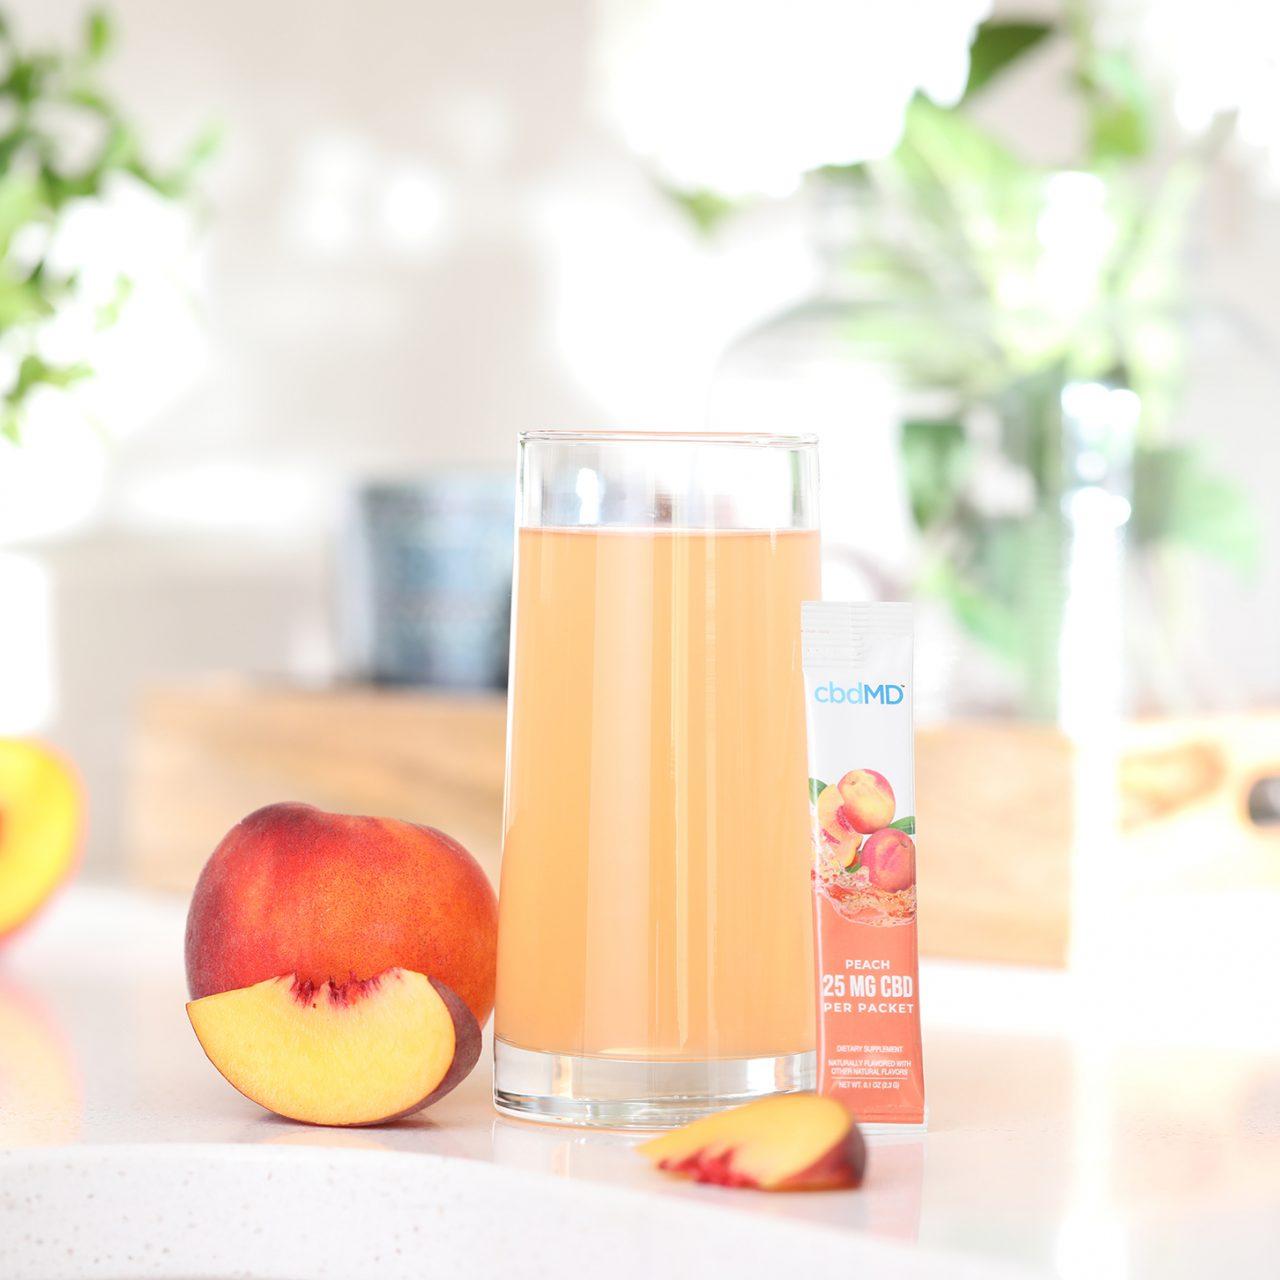 cbdMD, CBD Powdered Drink Mix, Broad Spectrum THC-Free, Peach, 10ct, 250mg CBD 3